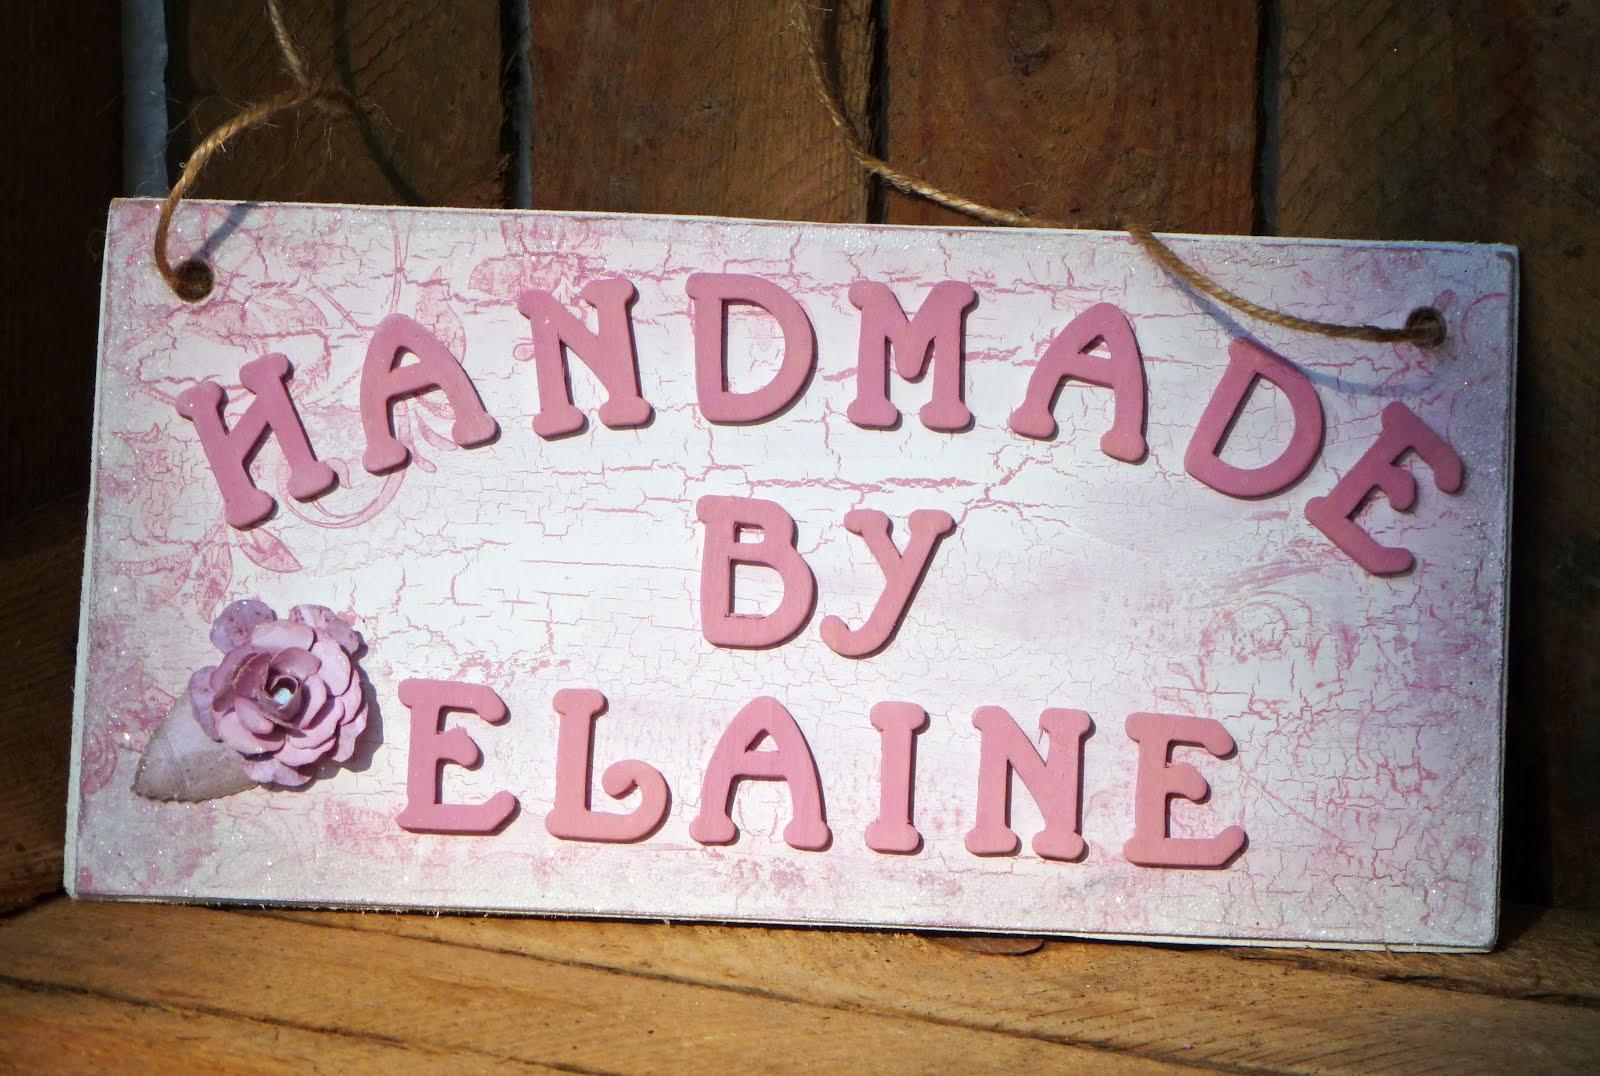 Handmade by Elaine